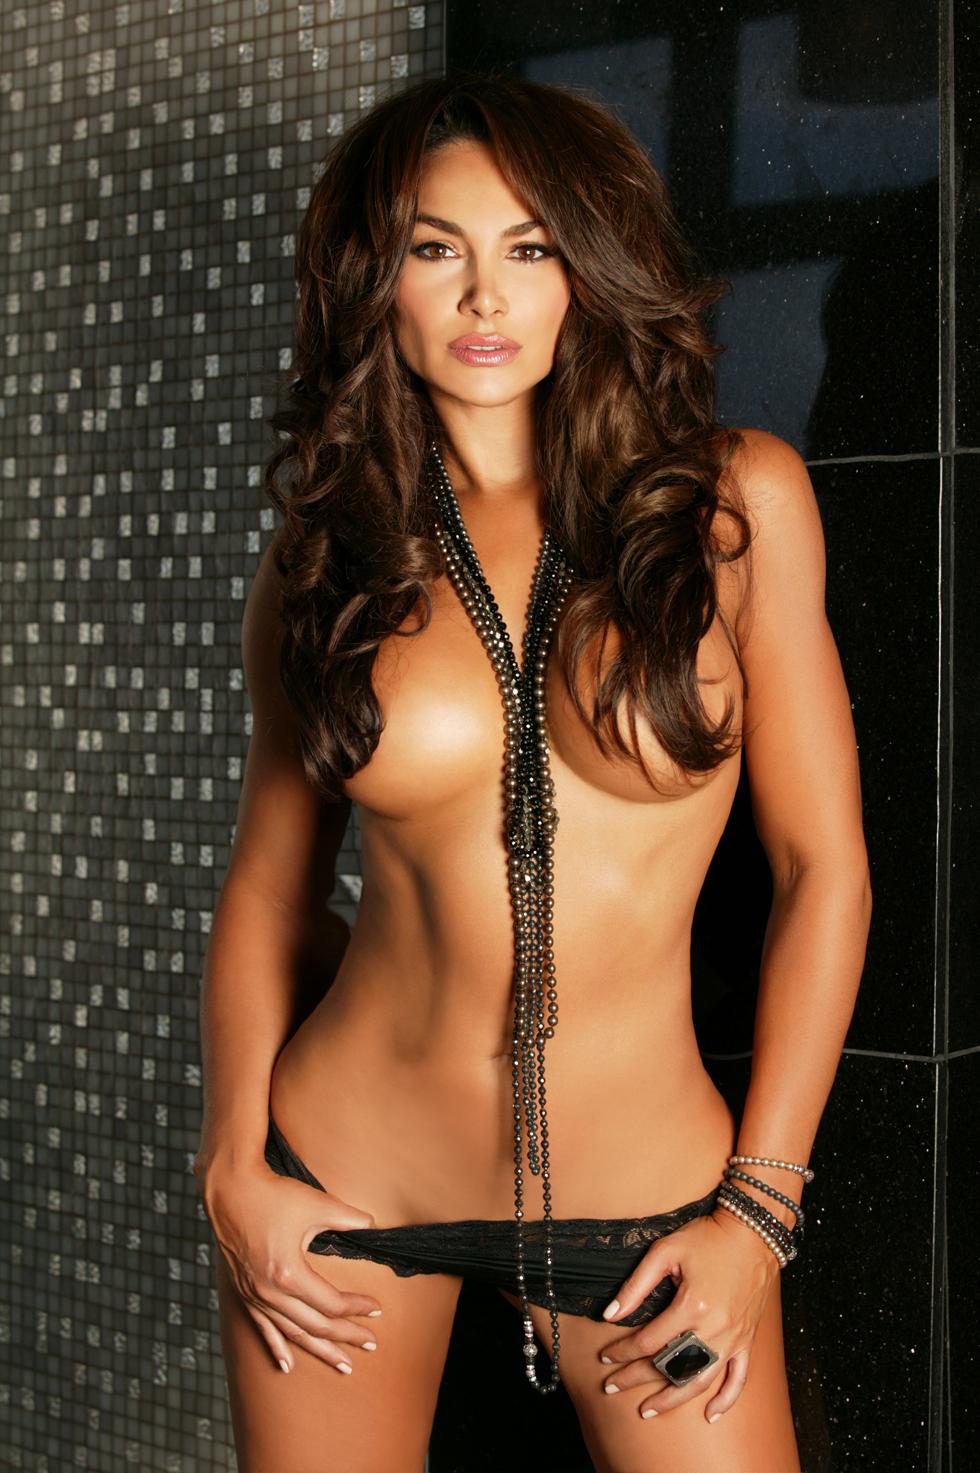 julia shober naked pussy